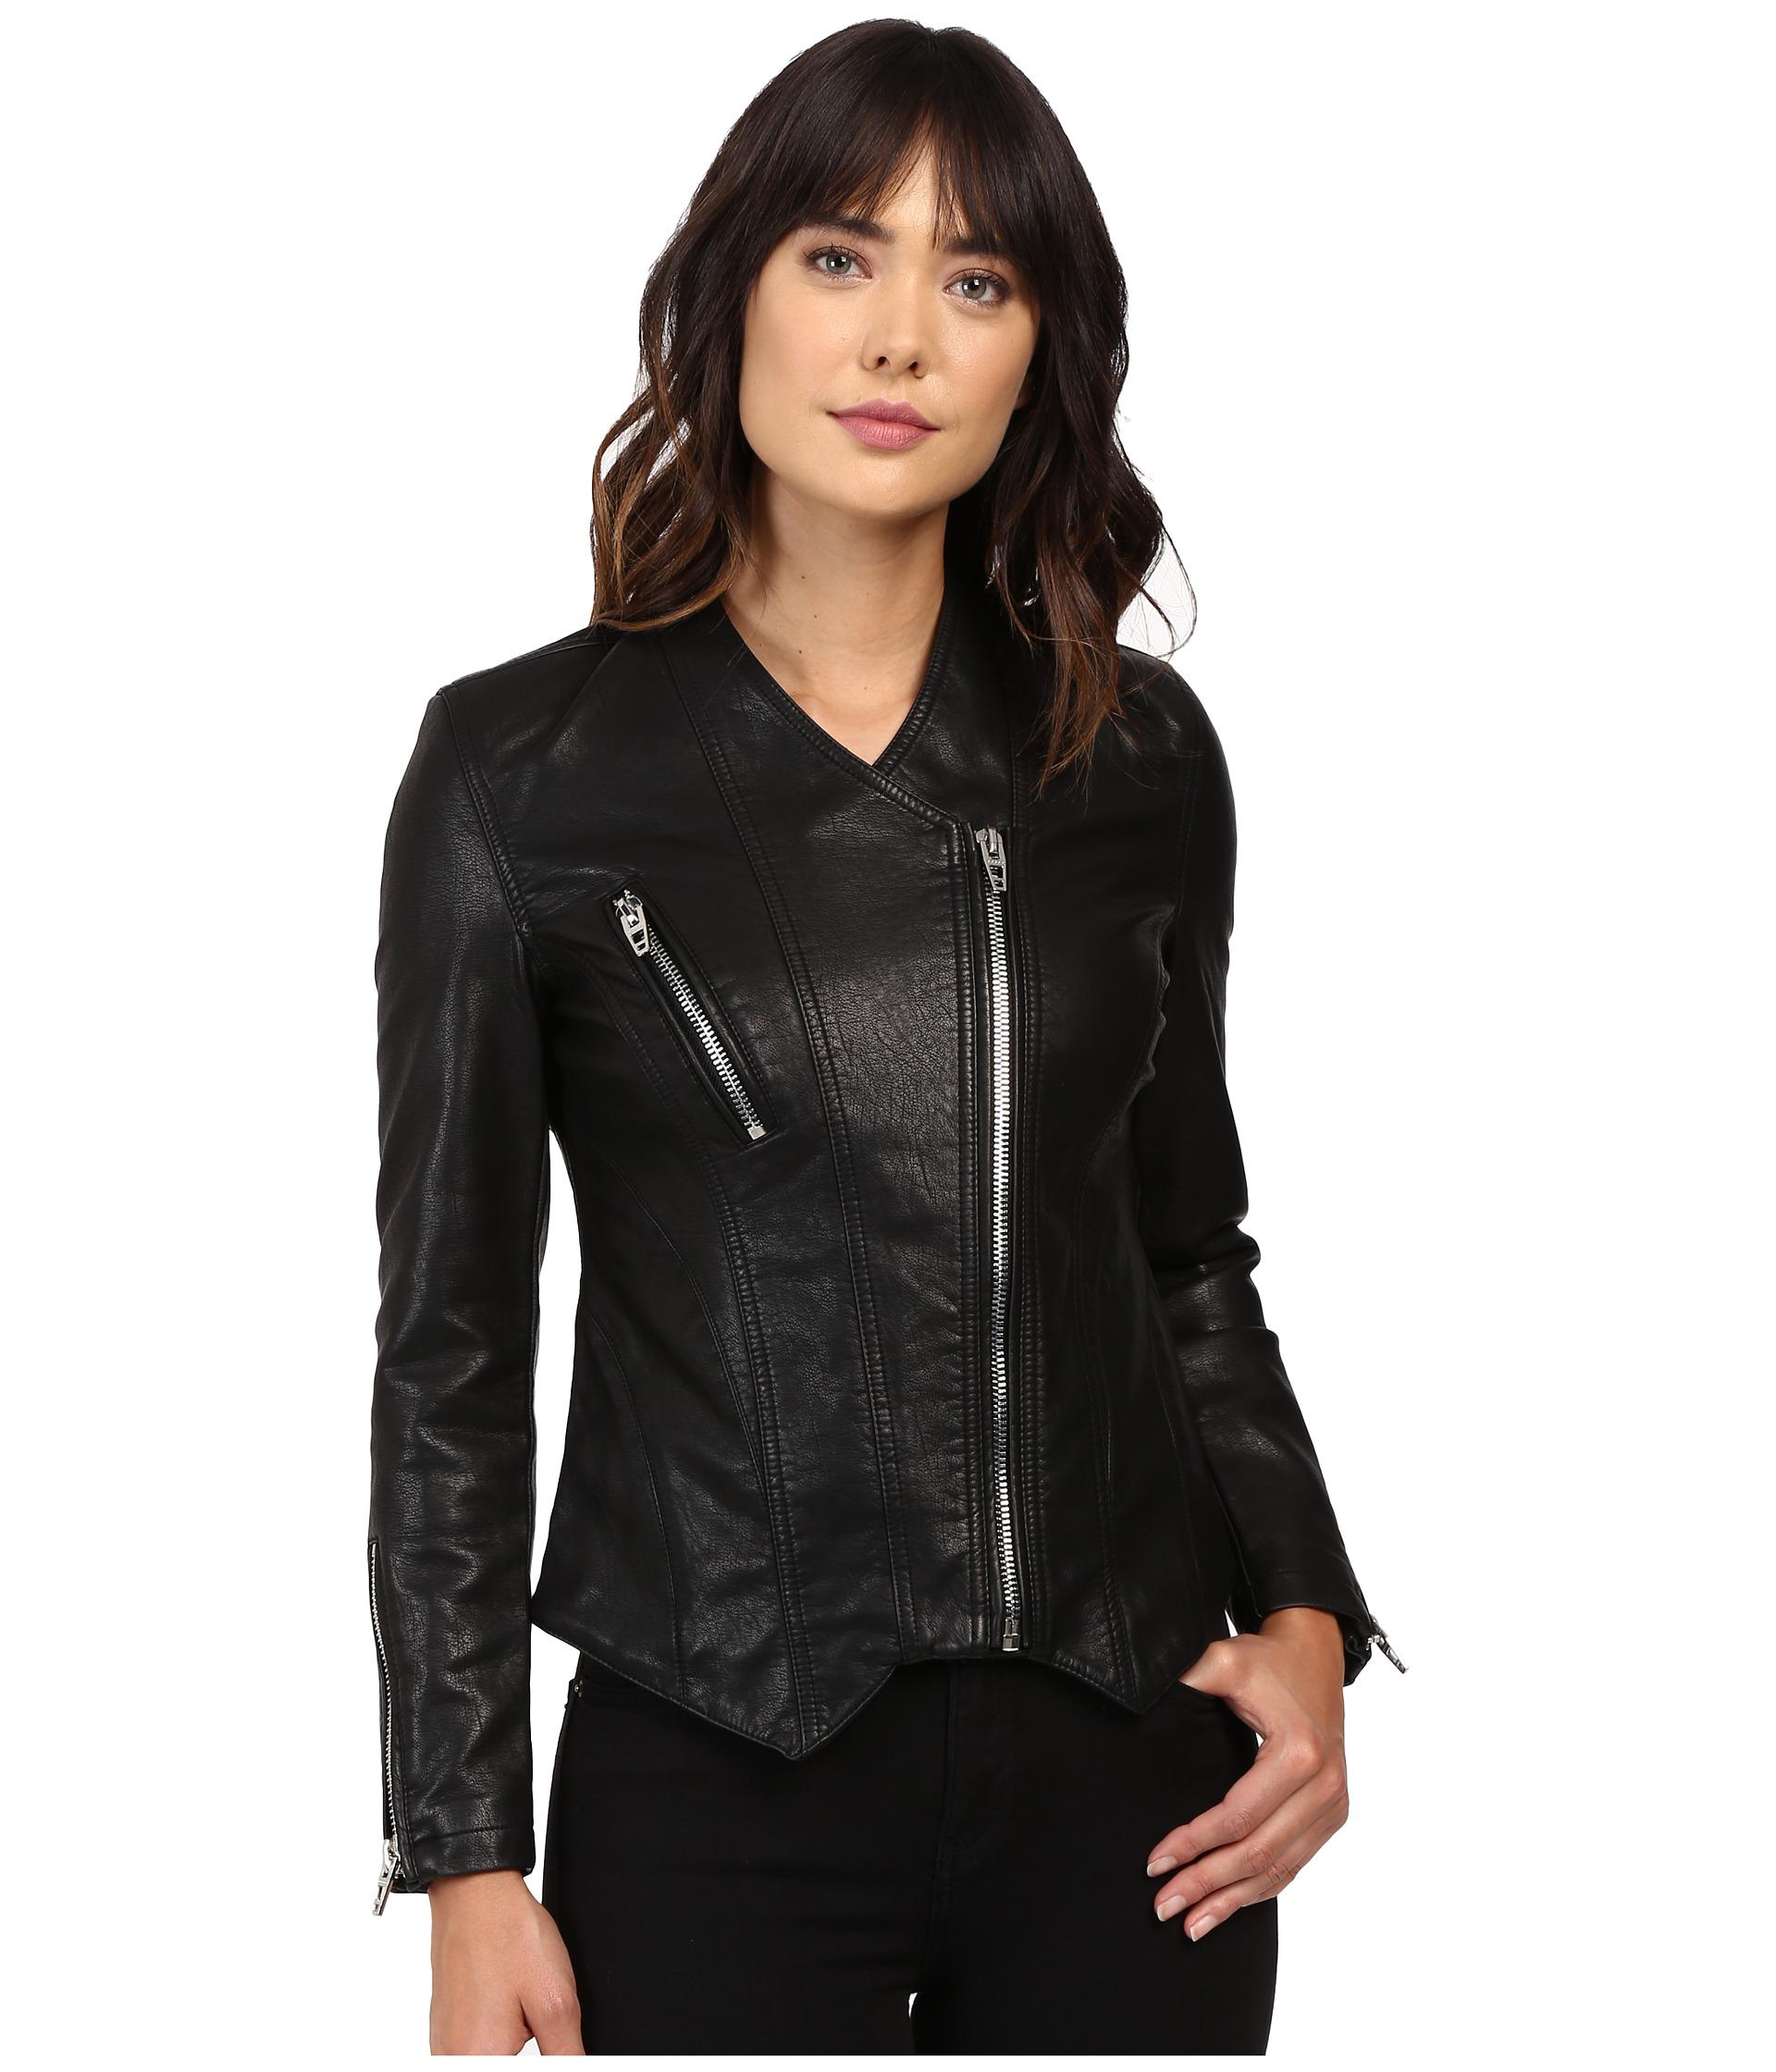 Power trip leather jacket